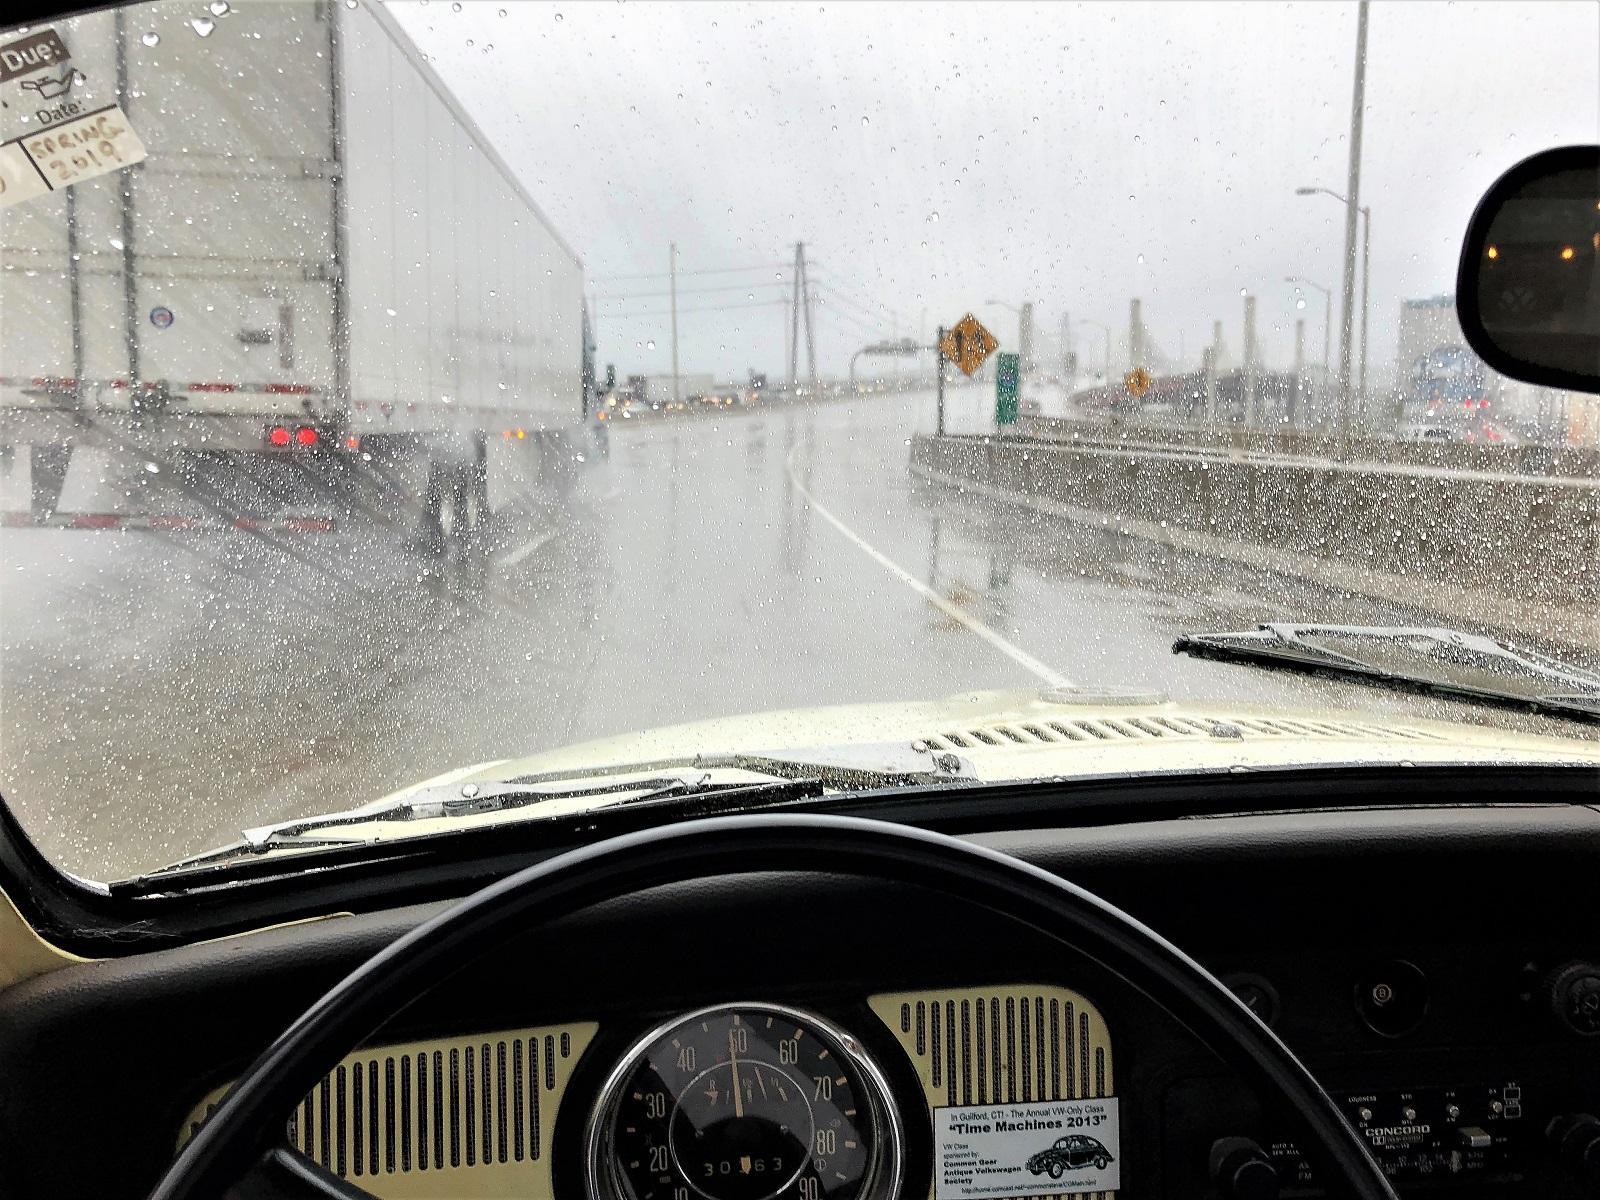 Rainy season returns to Southern Connecticut...